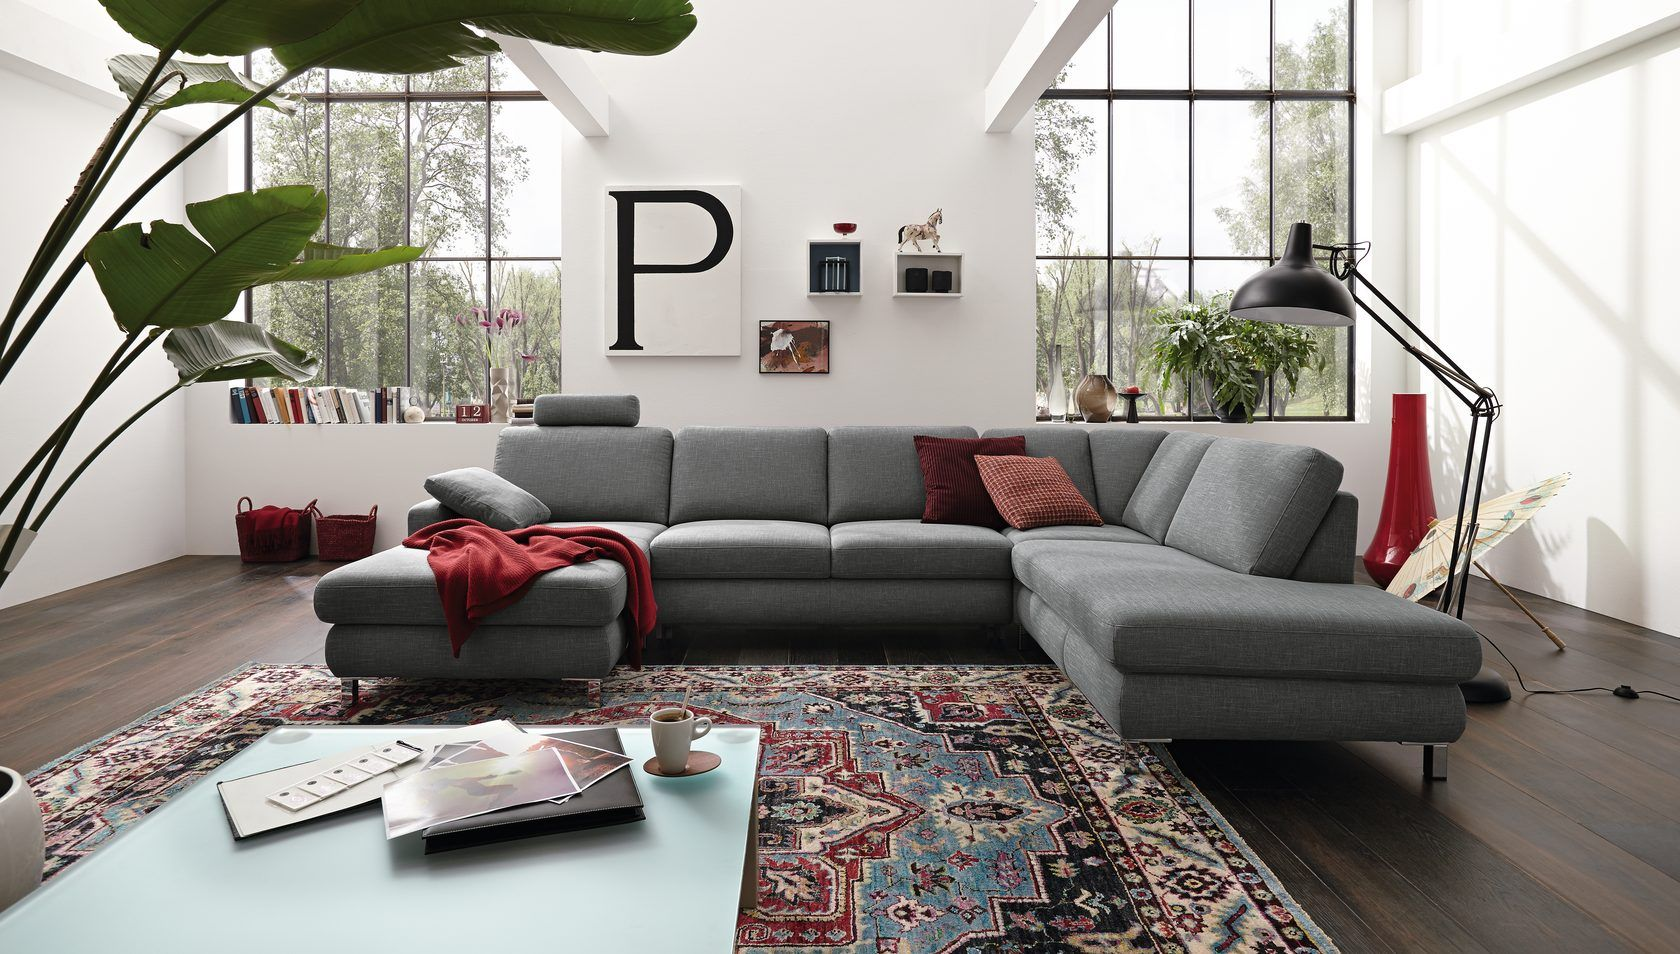 mr 365 musterring international my sweet little. Black Bedroom Furniture Sets. Home Design Ideas